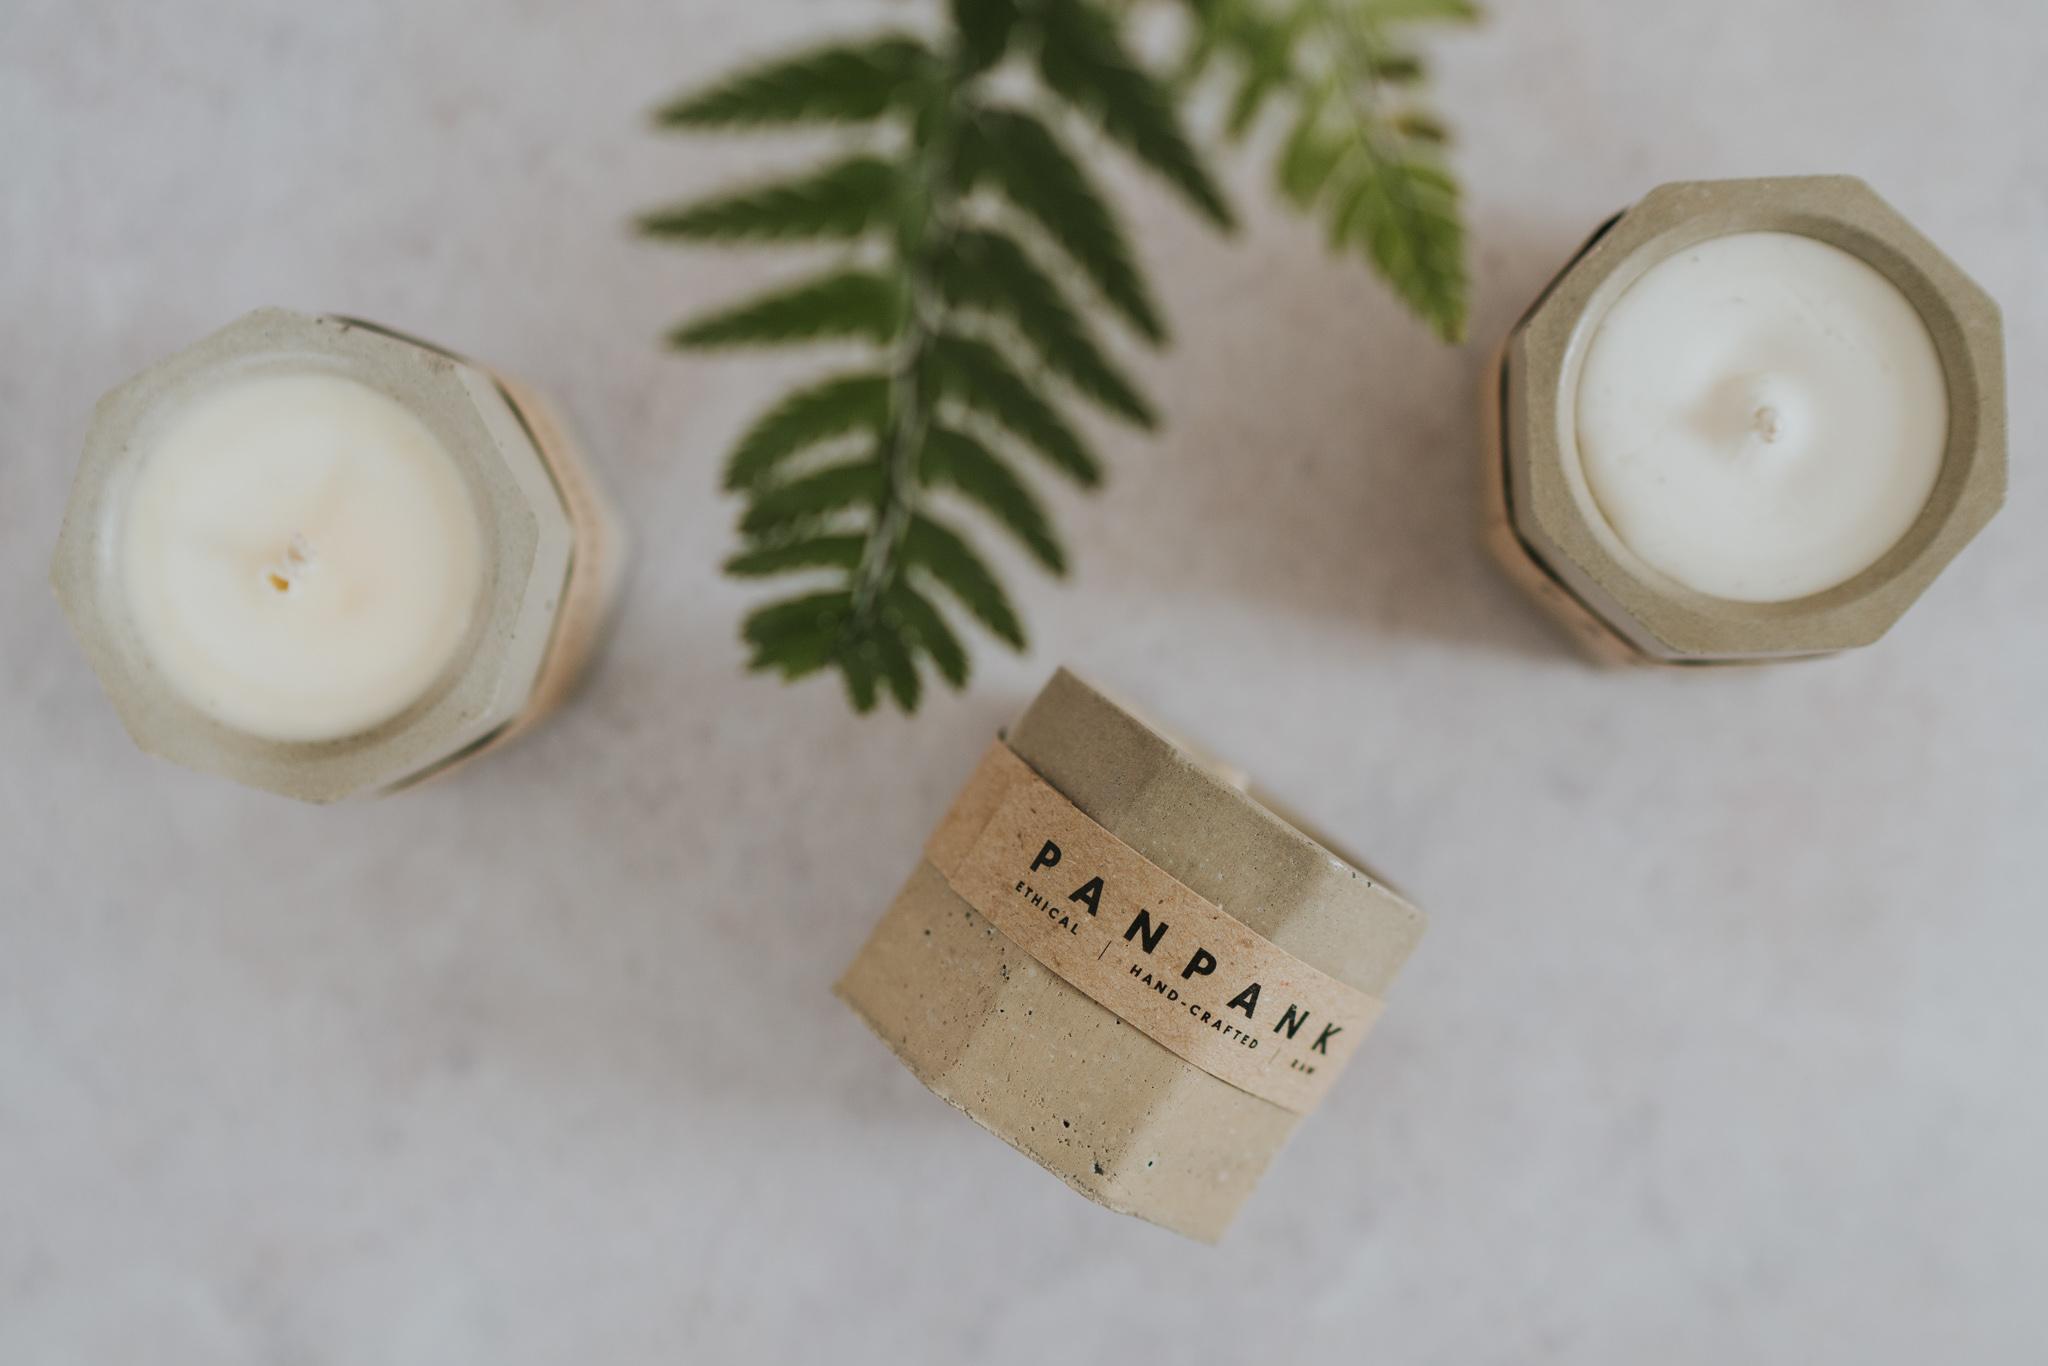 business-branding-panpank-candles-grace-elizabeth-colchester-essex-devon-suffolk-and-norfolk-alternative-wedding-and-family-photographer (11 of 19).jpg